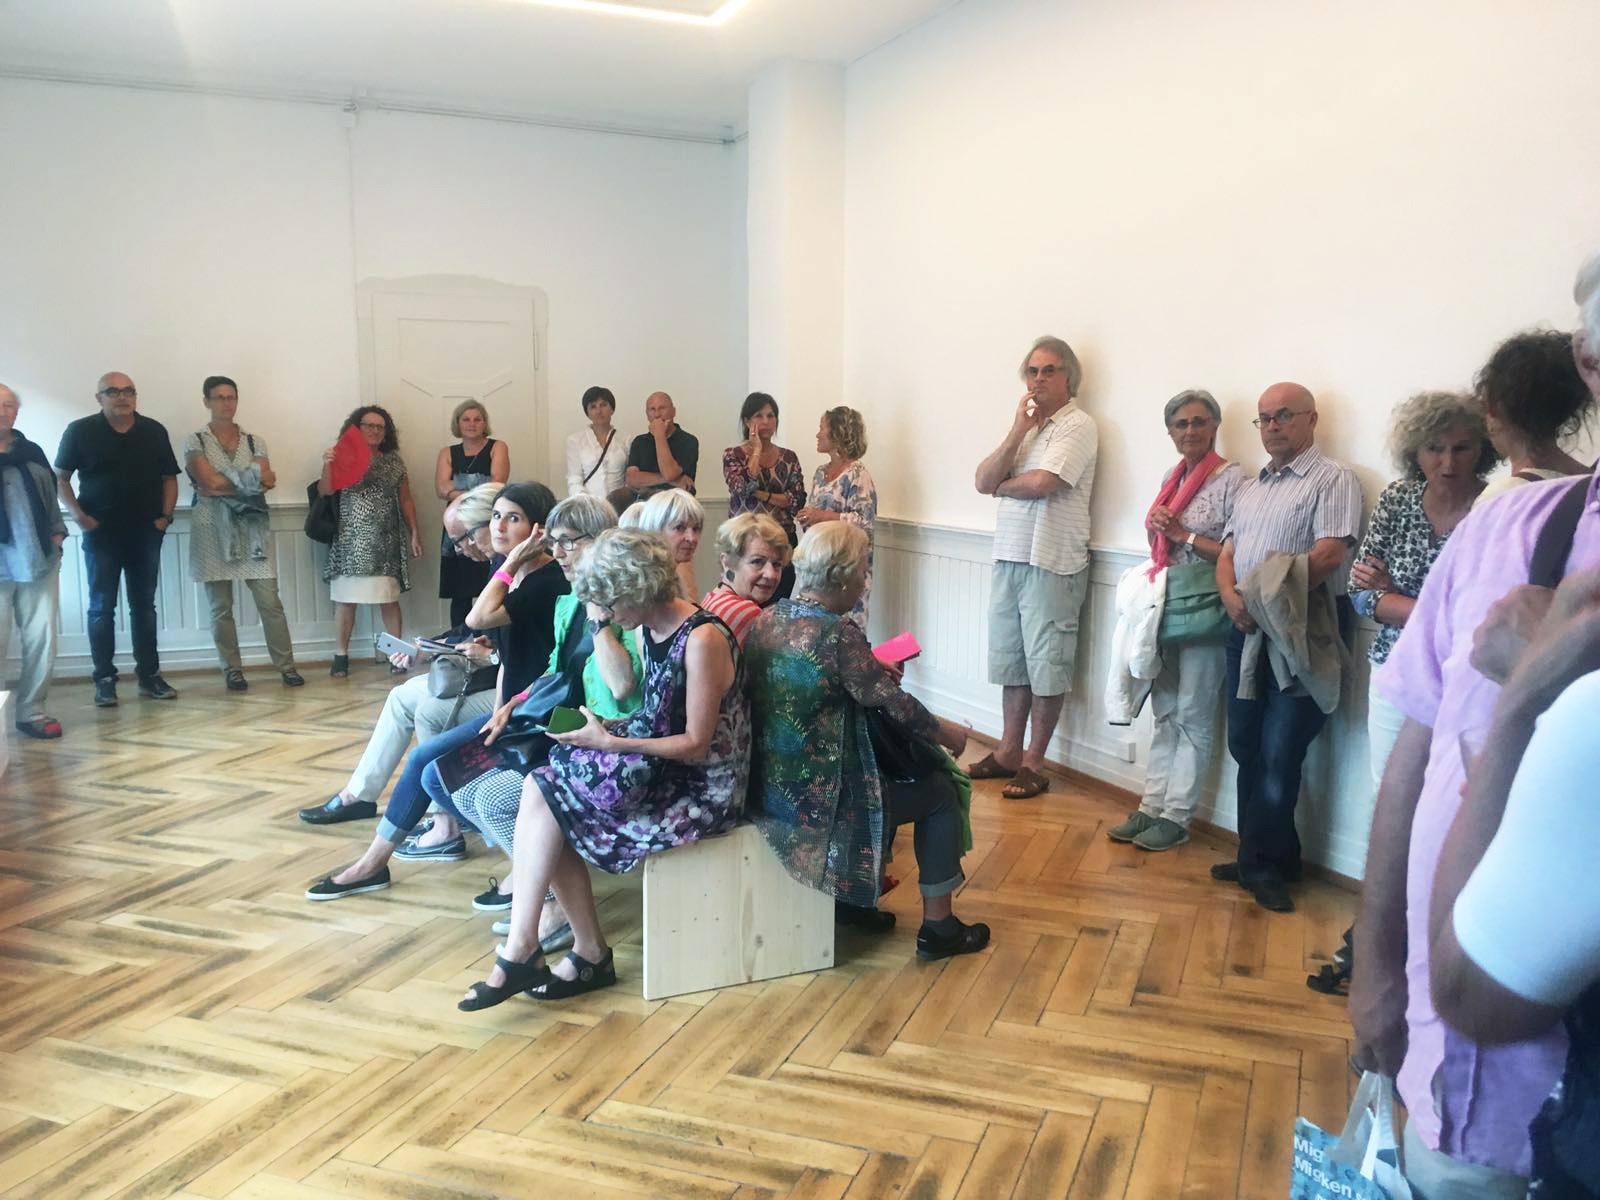 Museum of Emptiness / Eröffnung MoE / Foto: Paul Divjak